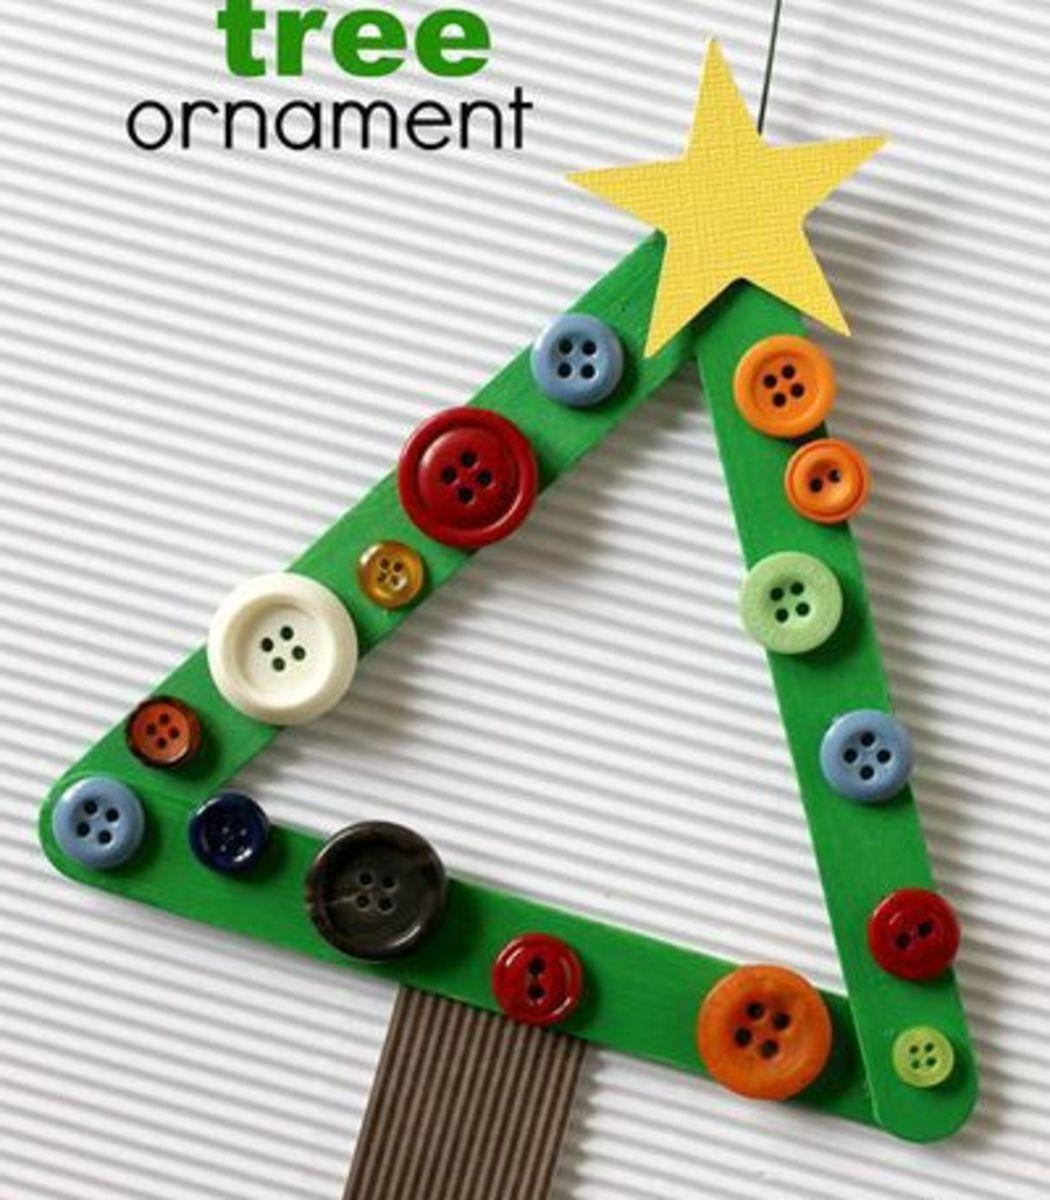 7 Easy Tree Ornament